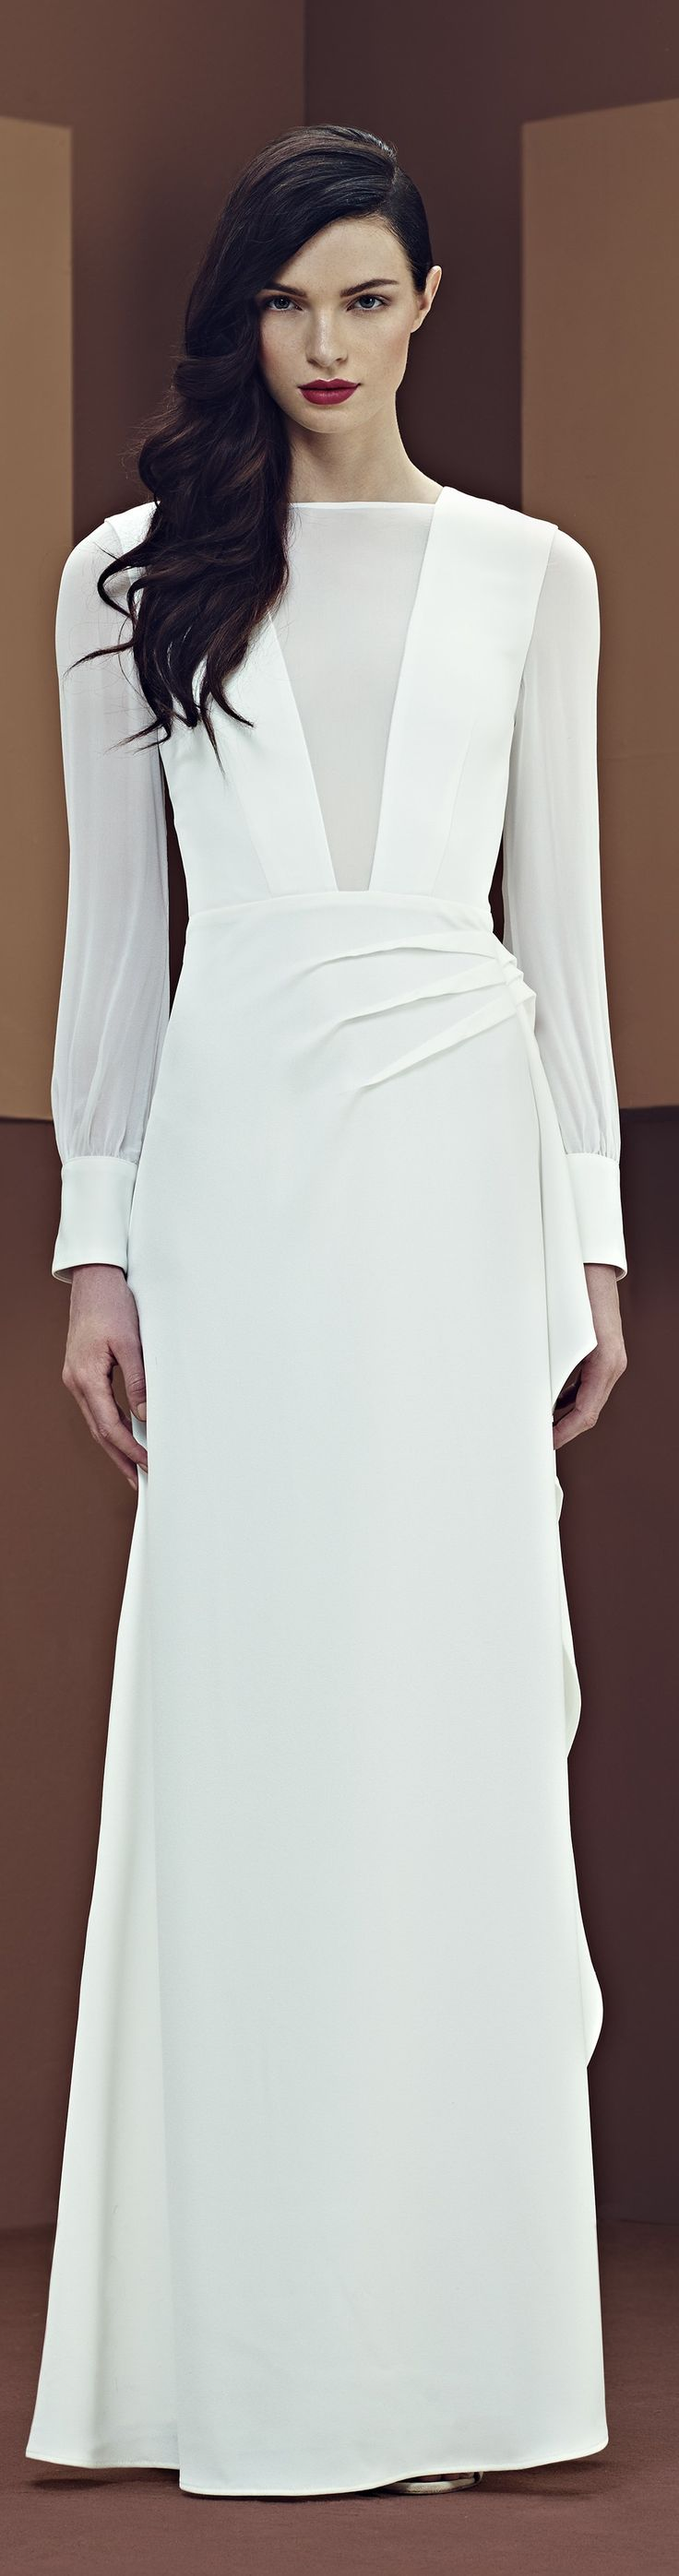 Rosamaria G Frangini | White Desire | Elisabetta Franchi.